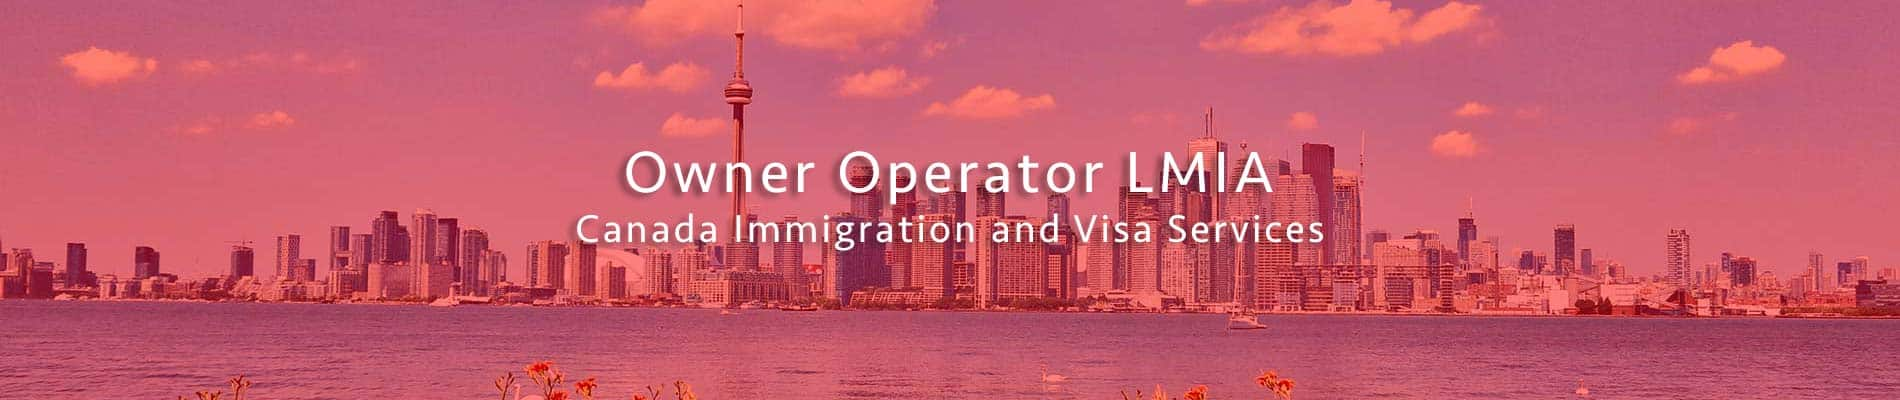 owner-operator-lmia-header-civs